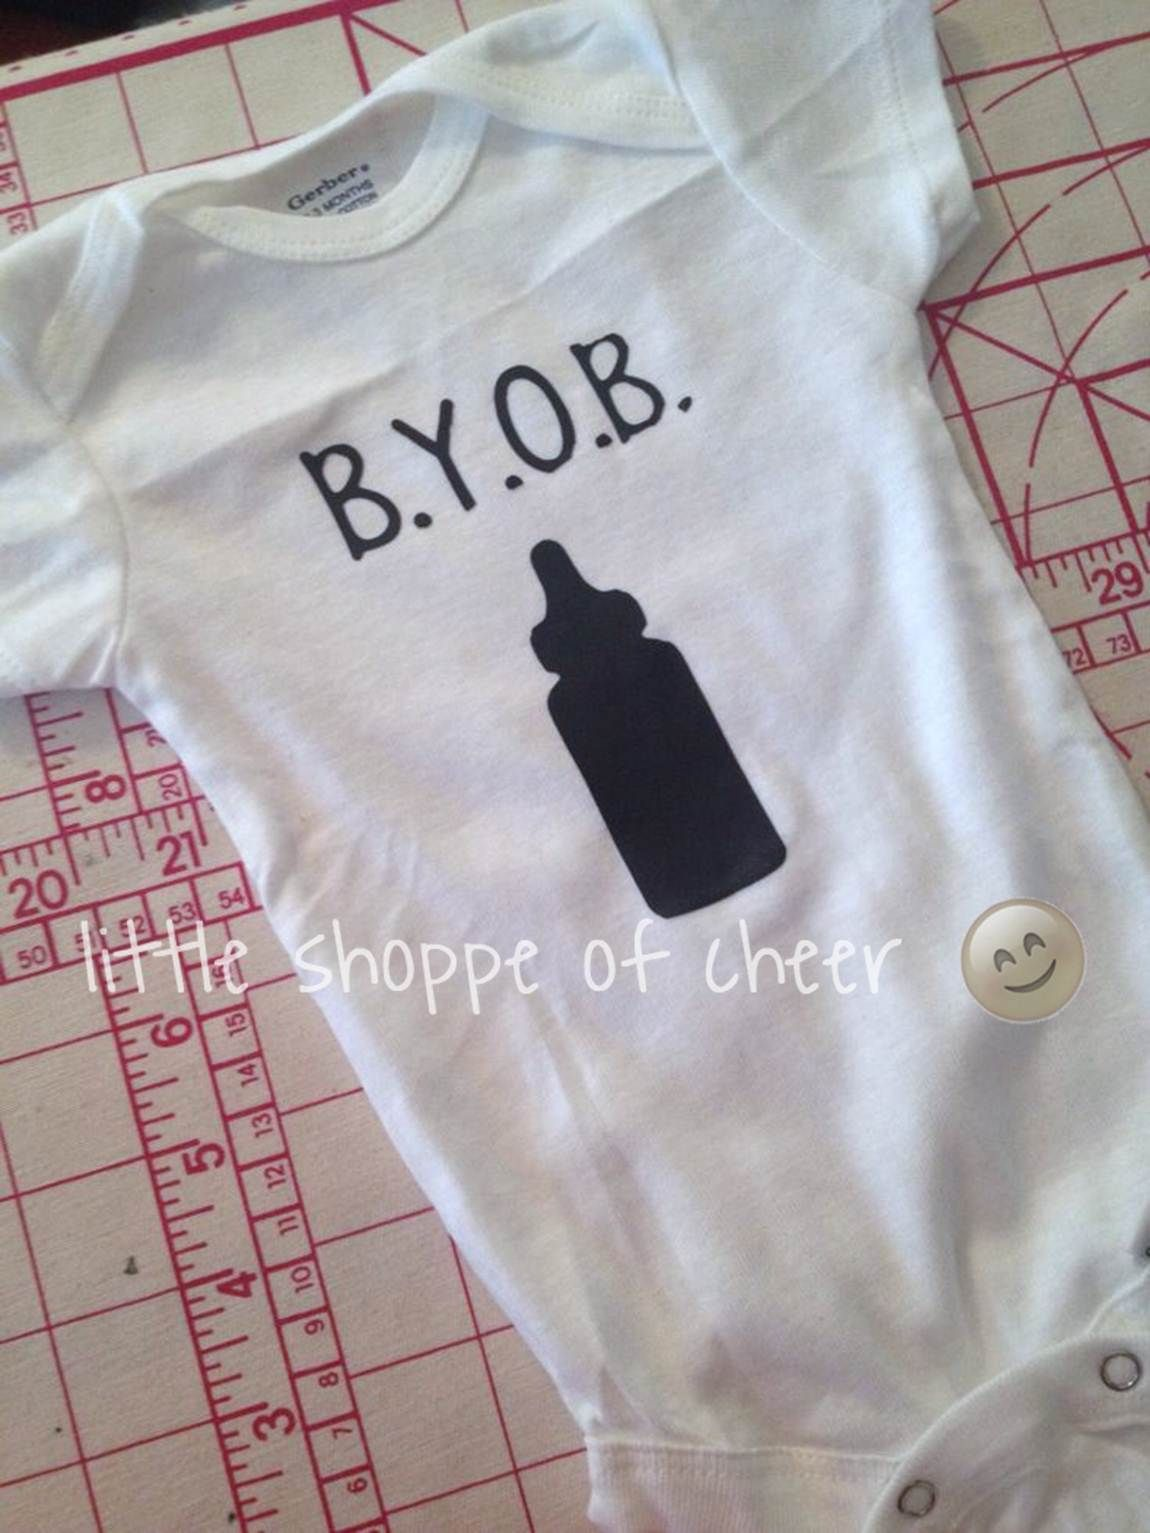 BYOB onesie for baby Logan #littleshoppeofcheer